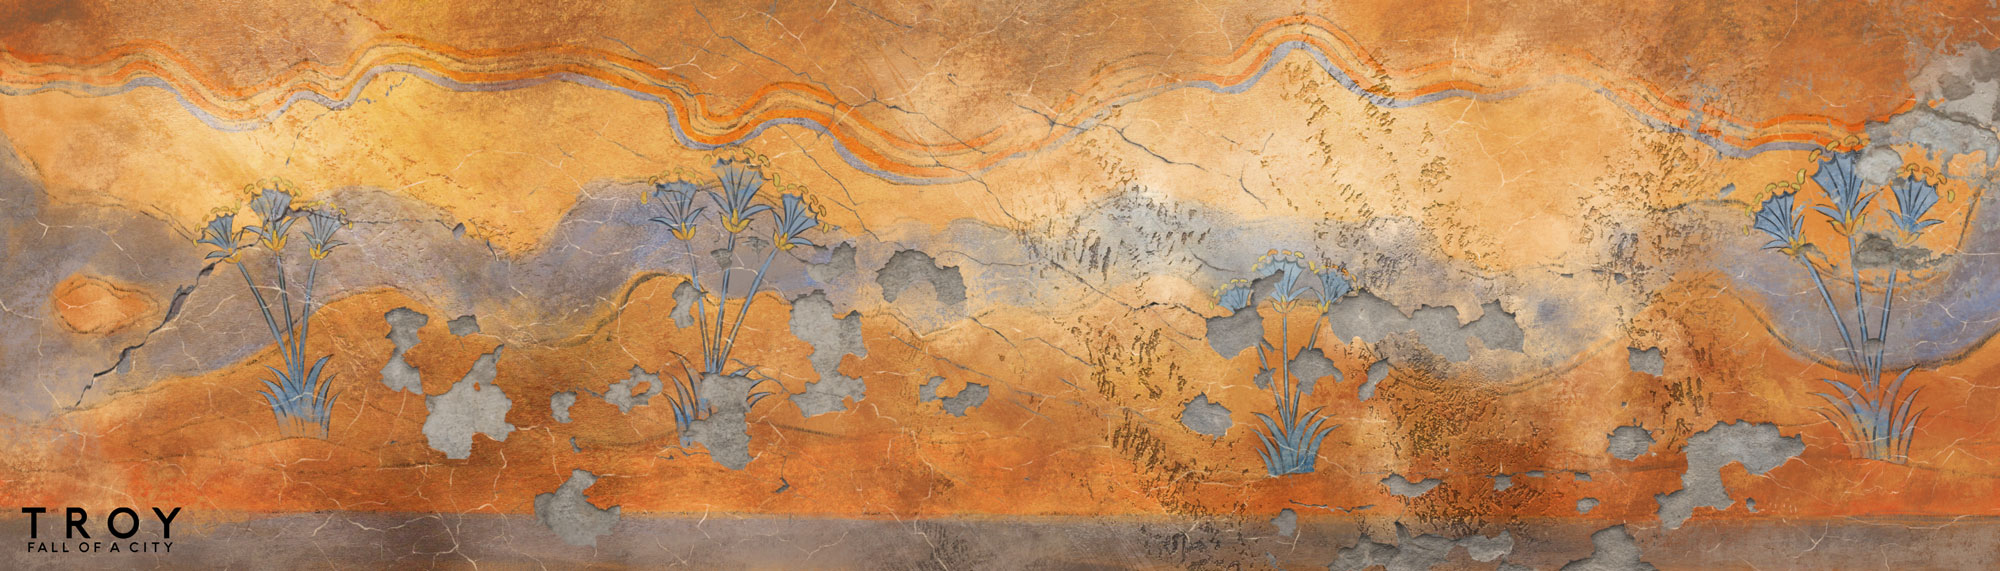 Troy_-_Palace_Mural_04_WEB.jpg